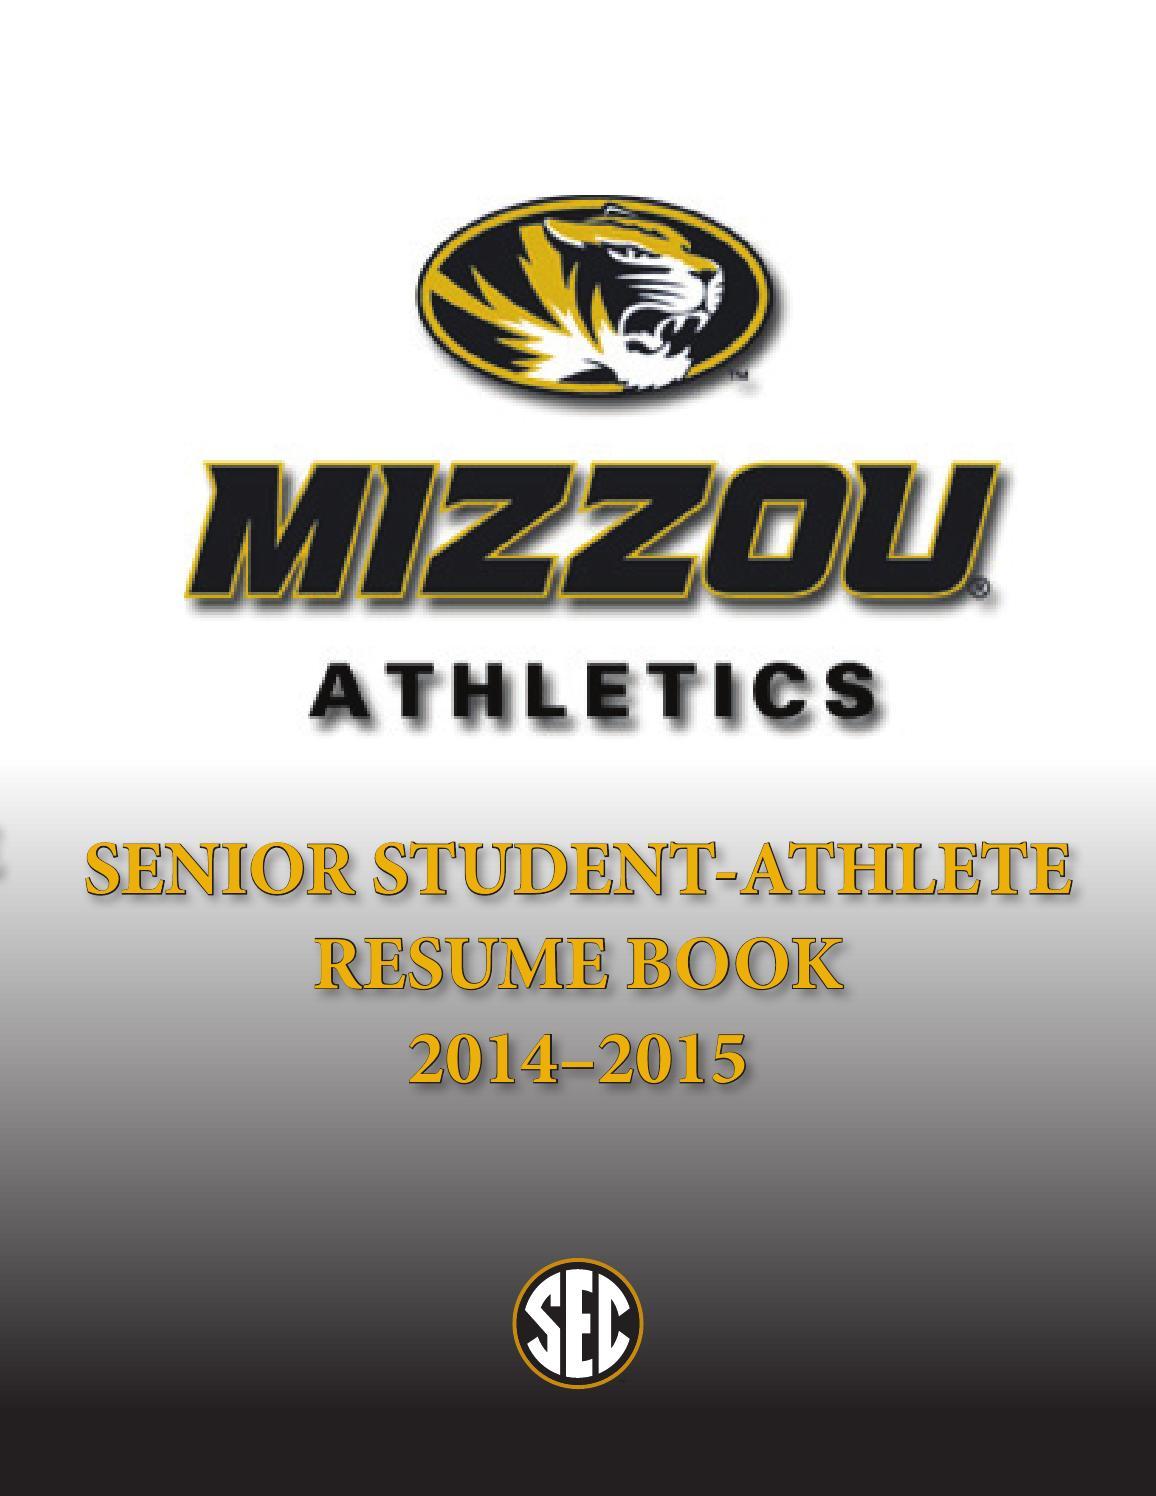 2014 2015 mizzou athletics senior resume book by kim bishop university of missouri associate athletic director for student athlete development issuu